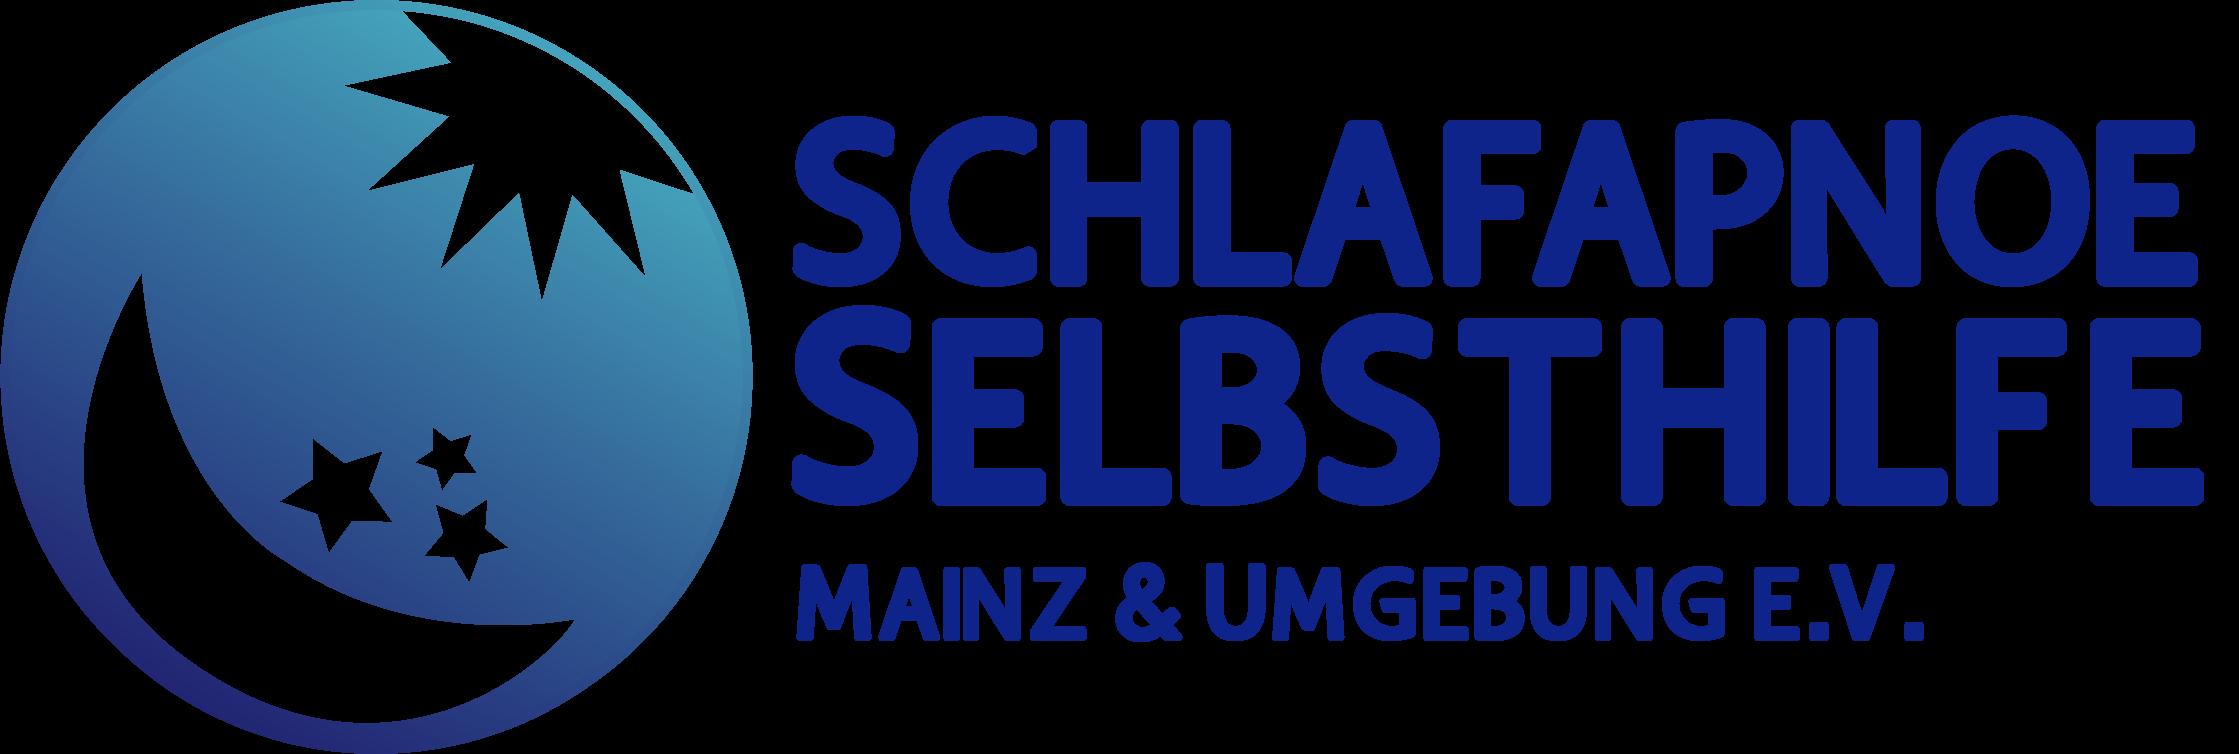 Schlafapnoe Selbsthilfe Mainz und Umgebung e.V.